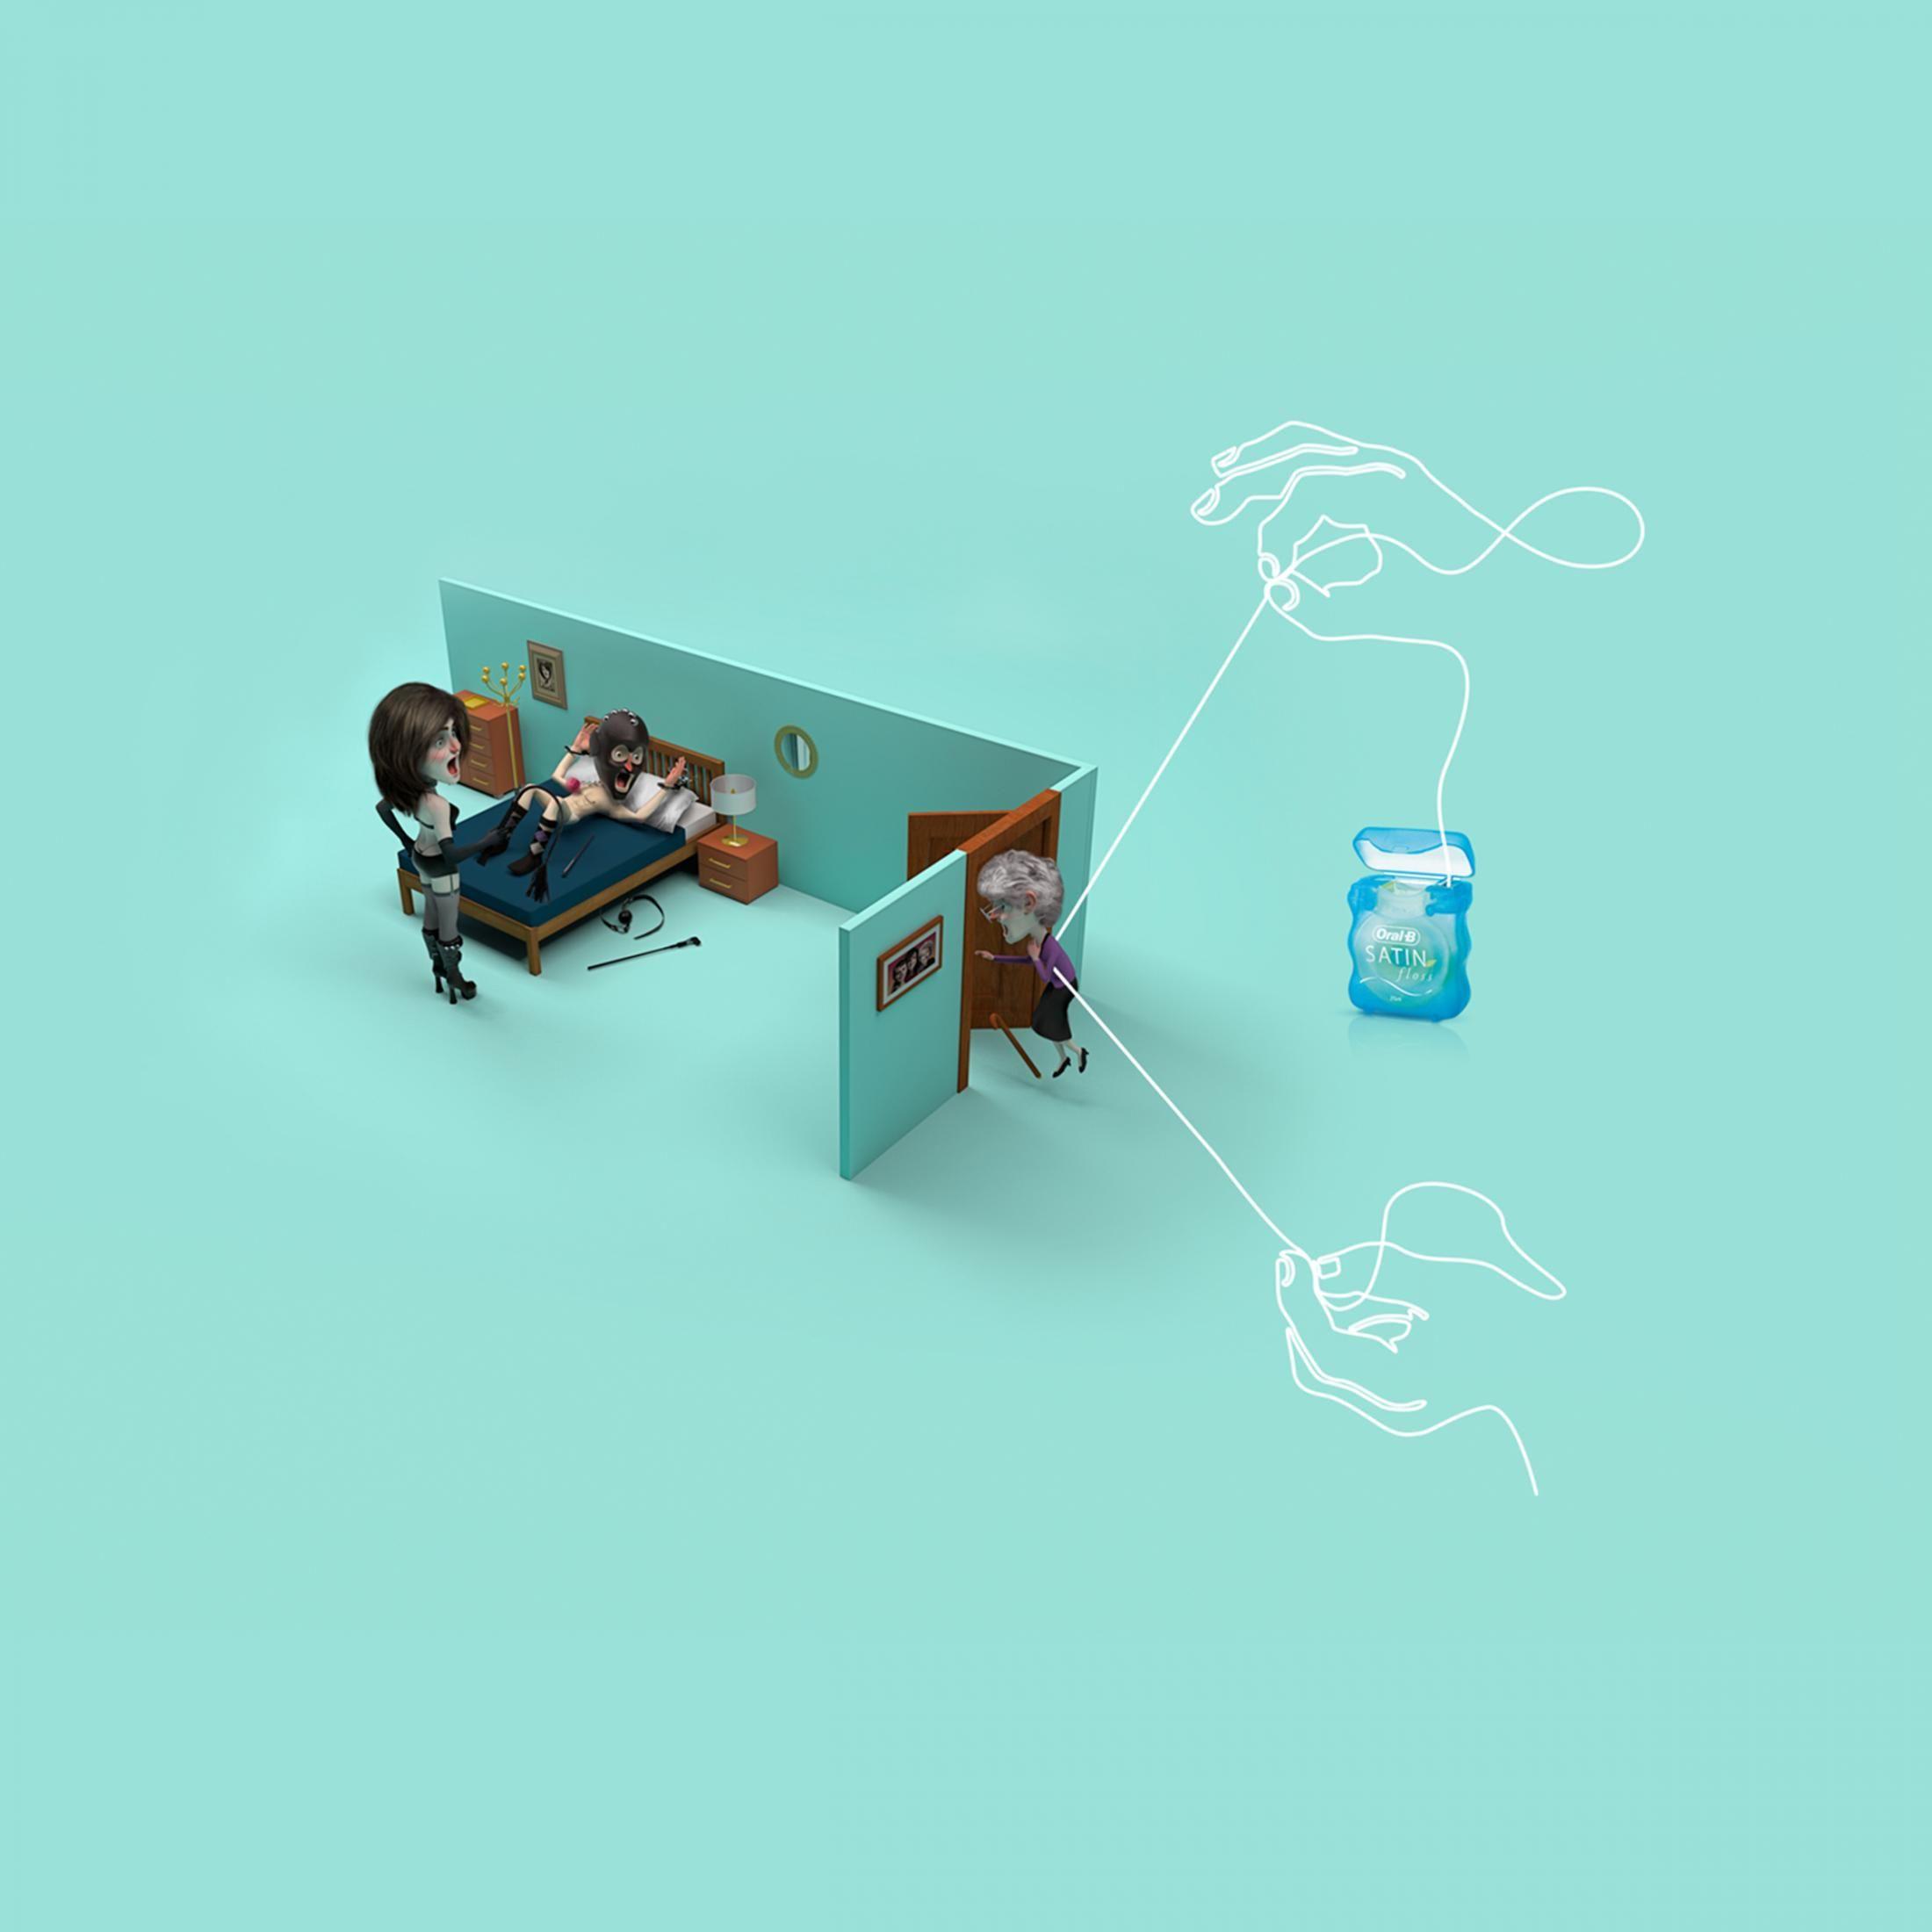 Oral-B: Awkward moments - grandma | Ads of the World™ | illustration